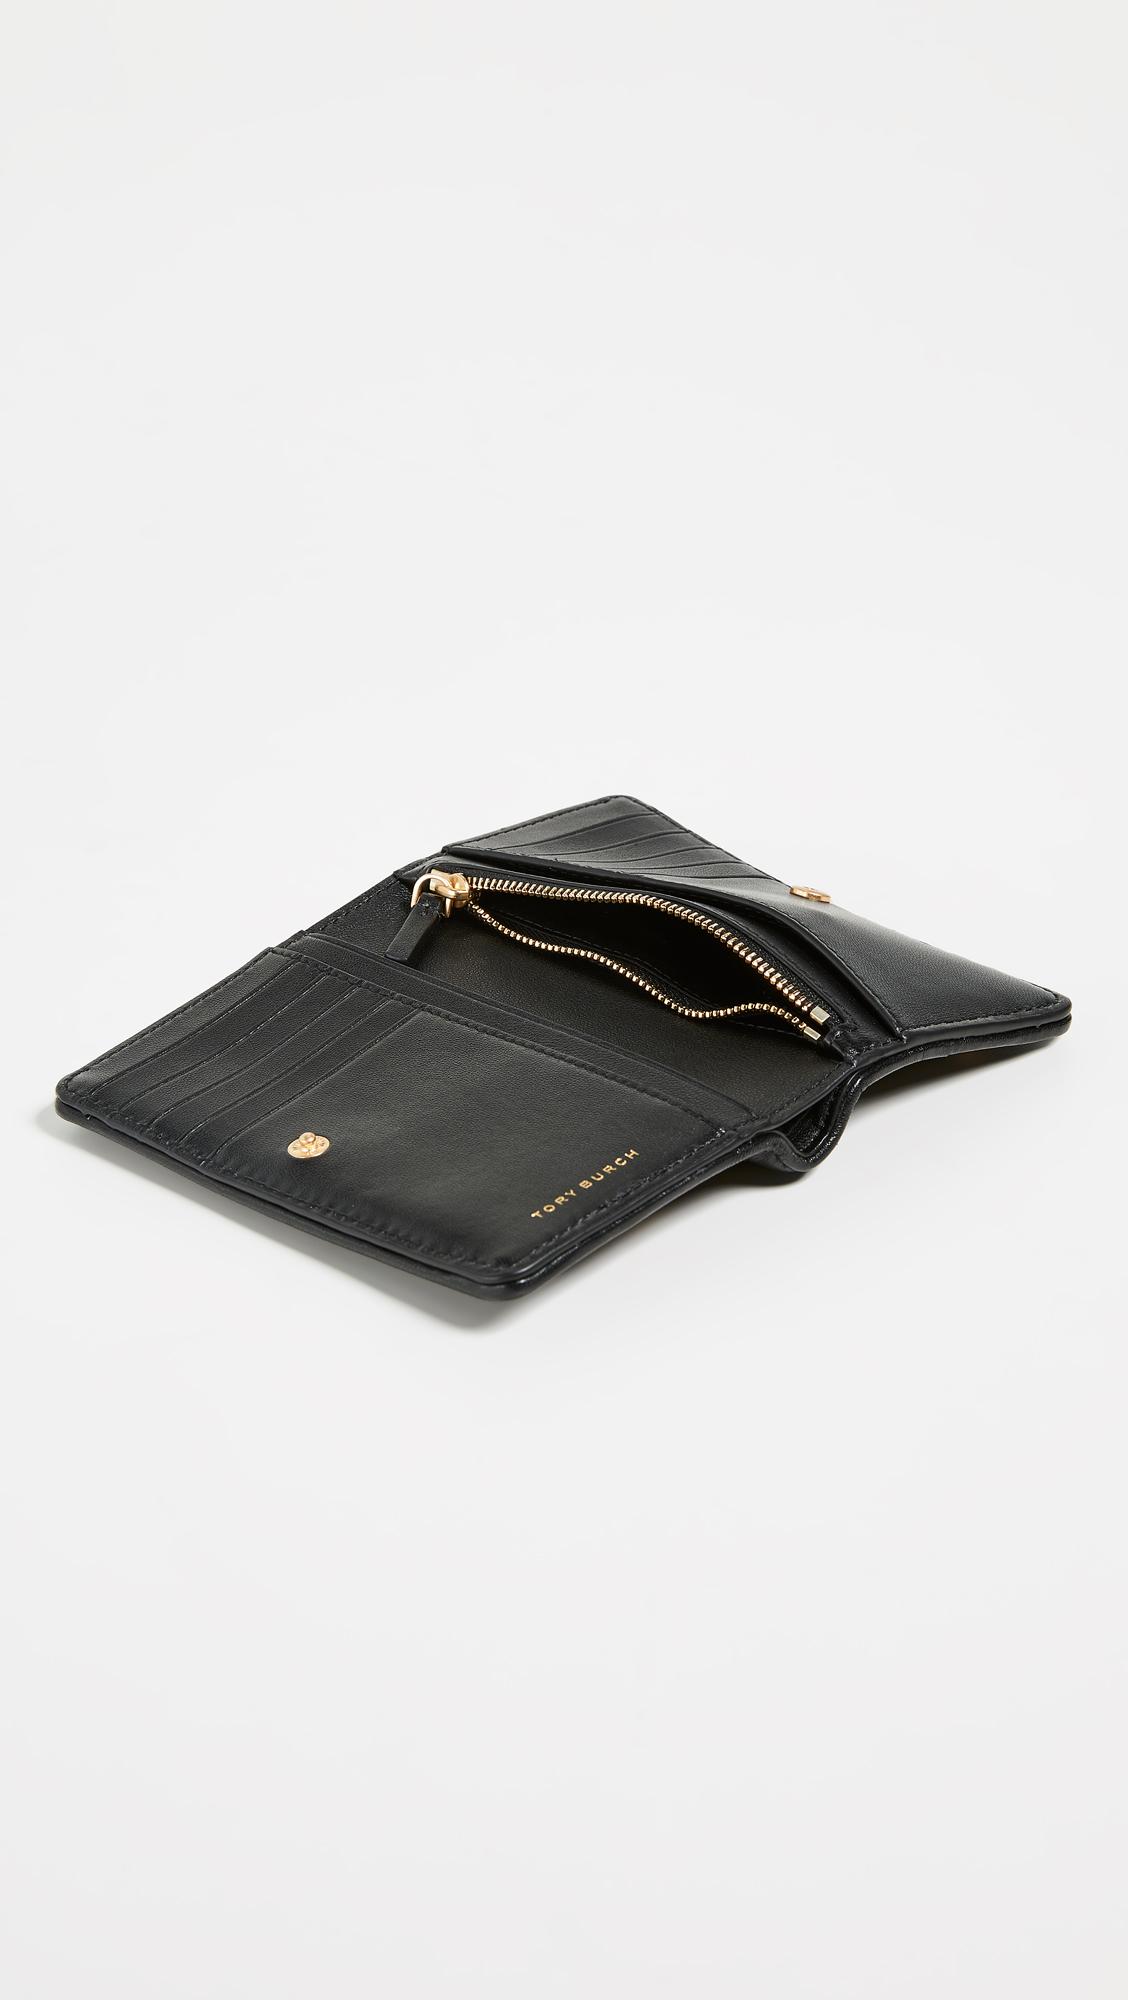 927c5dc1809 Tory Burch Star Stud Slim Medium Wallet